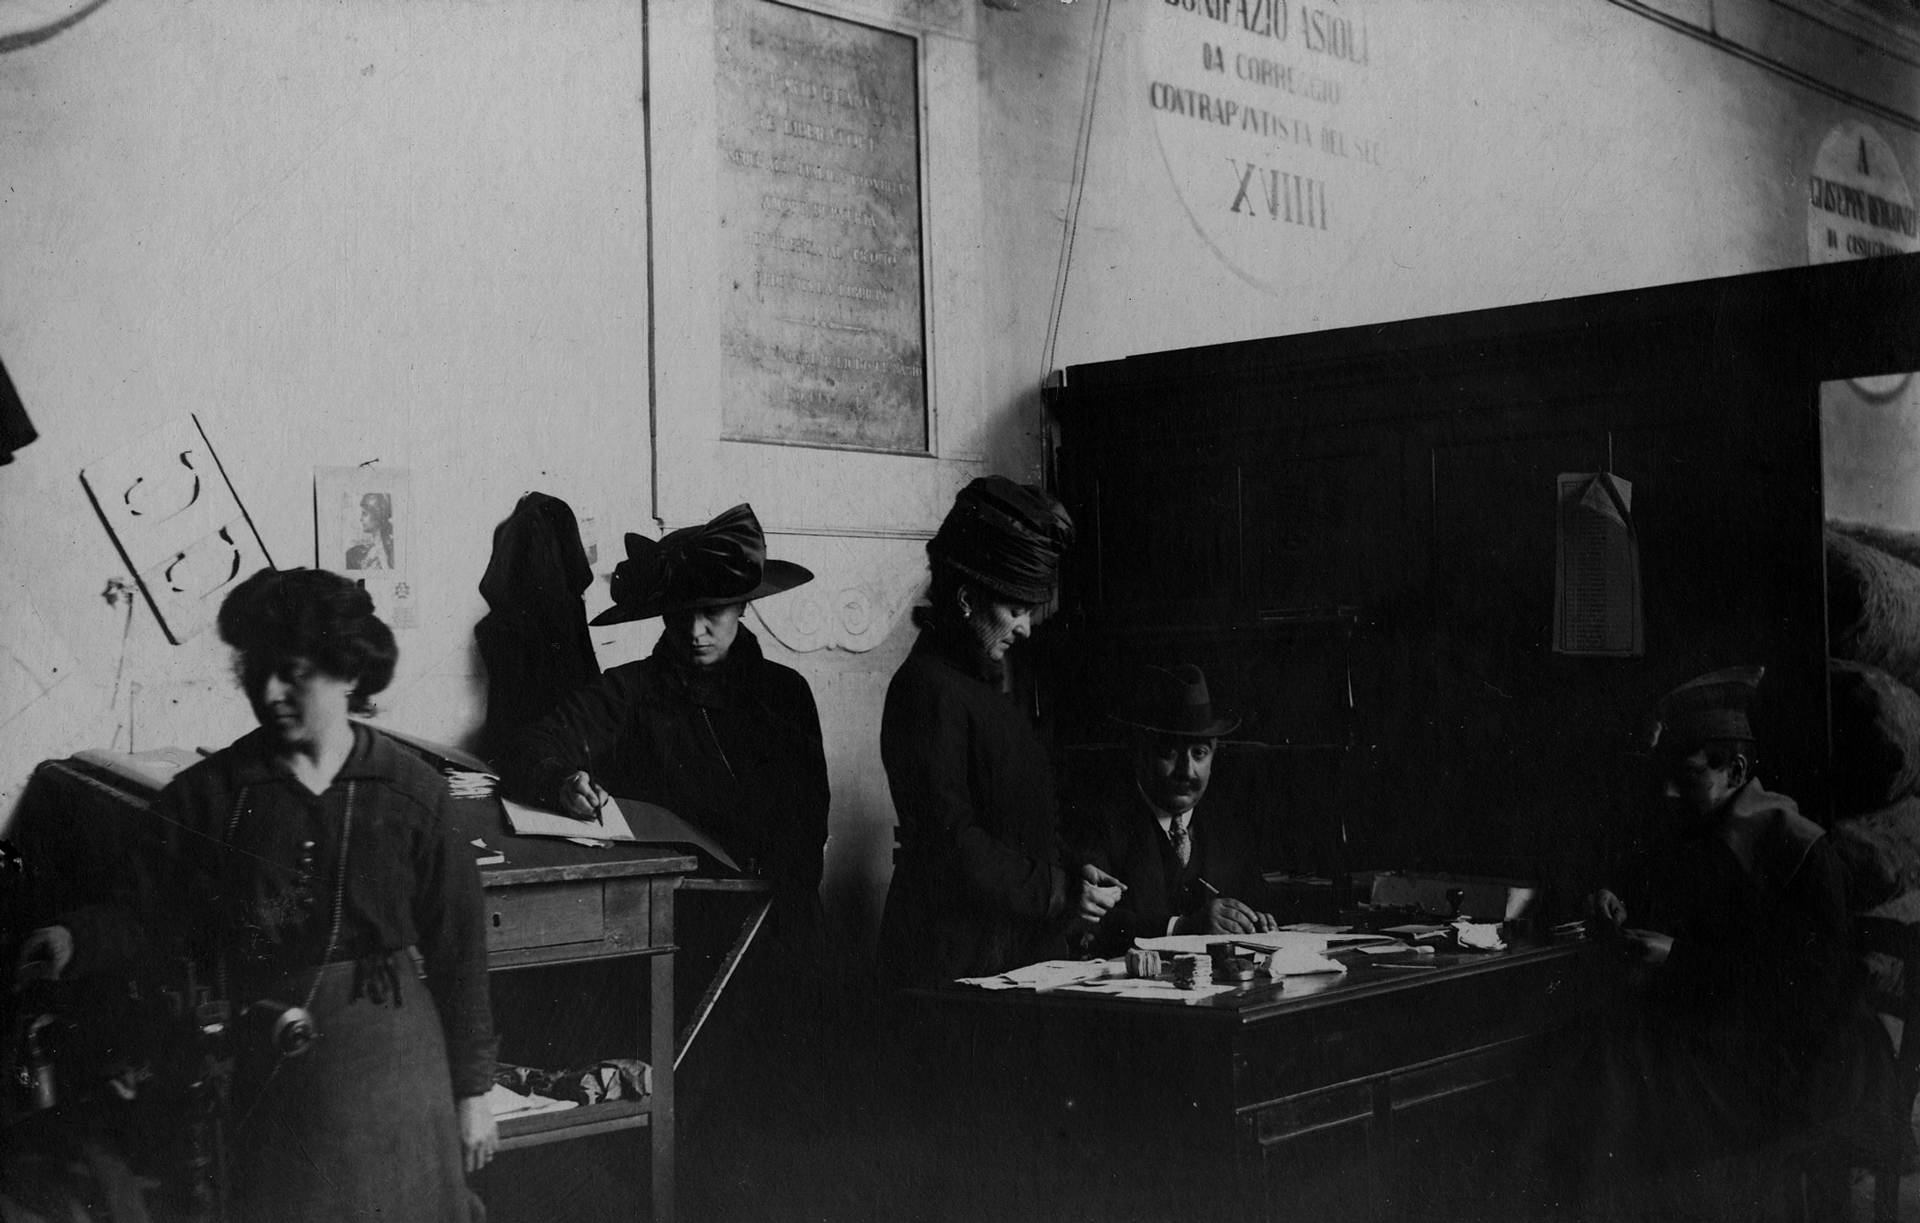 comitato femminile: APPROVVIGIONAMENTO SPACCIO SPALLANZANI, PALAZZO SAN GIORGIO FOTOTECA BIBLIOTECA PANIZZI, FOTO ROBERTO SEVARDI - REGGIO EMILIA 1919